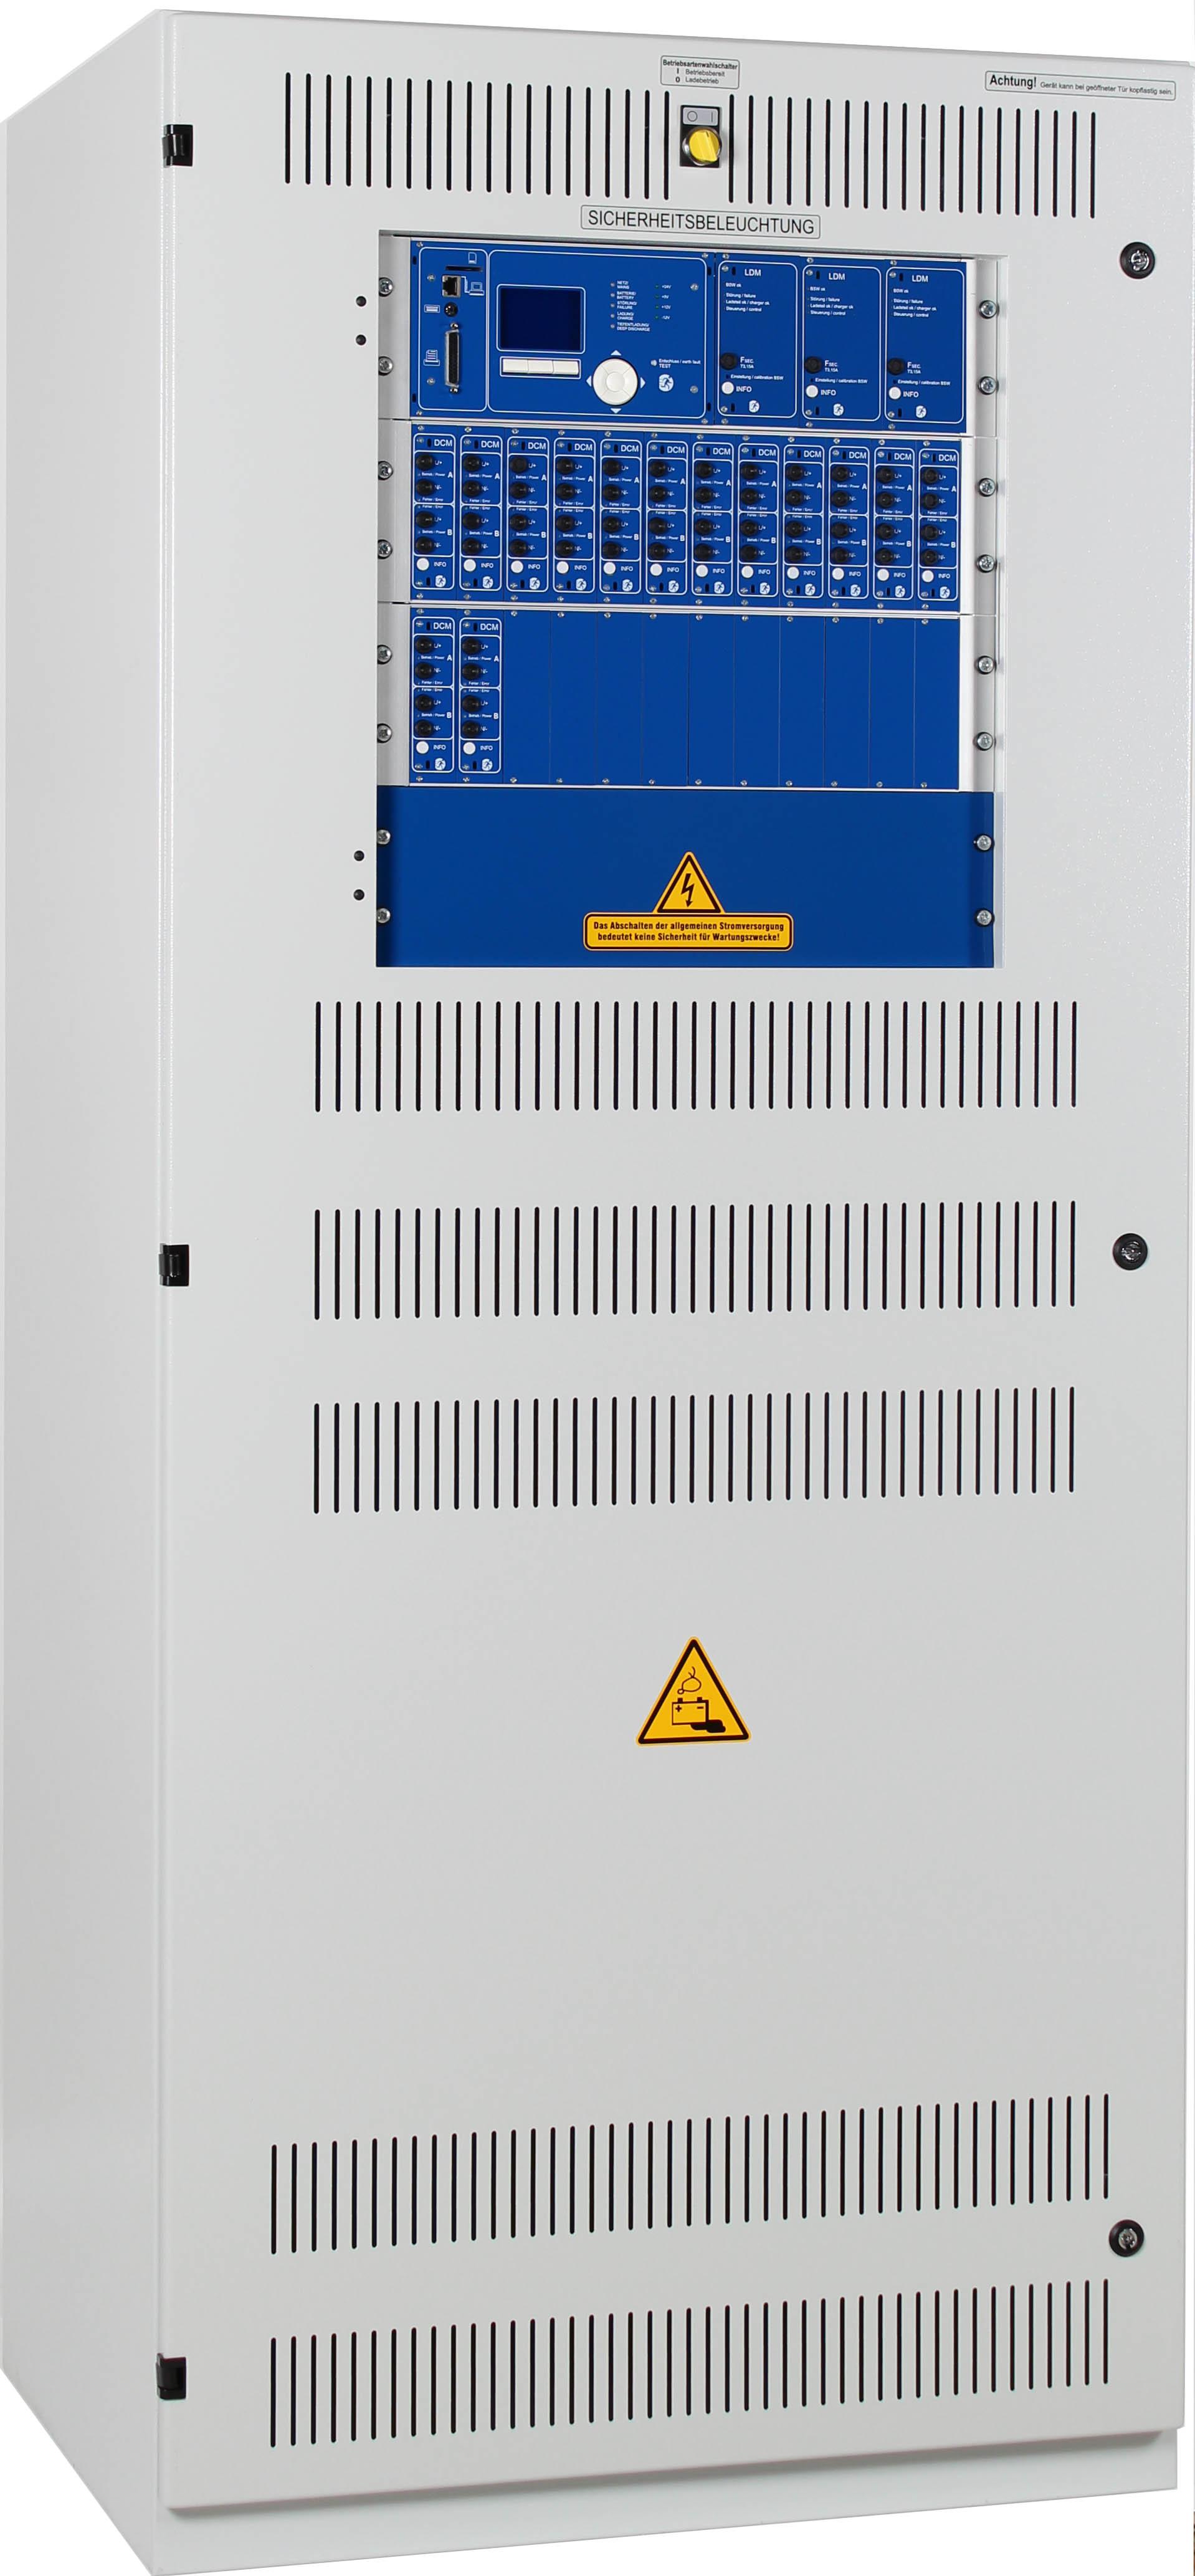 1 Stk Zentralbatterieanlage MaxiControl 36/5A, ohne DCM NLMCX236--